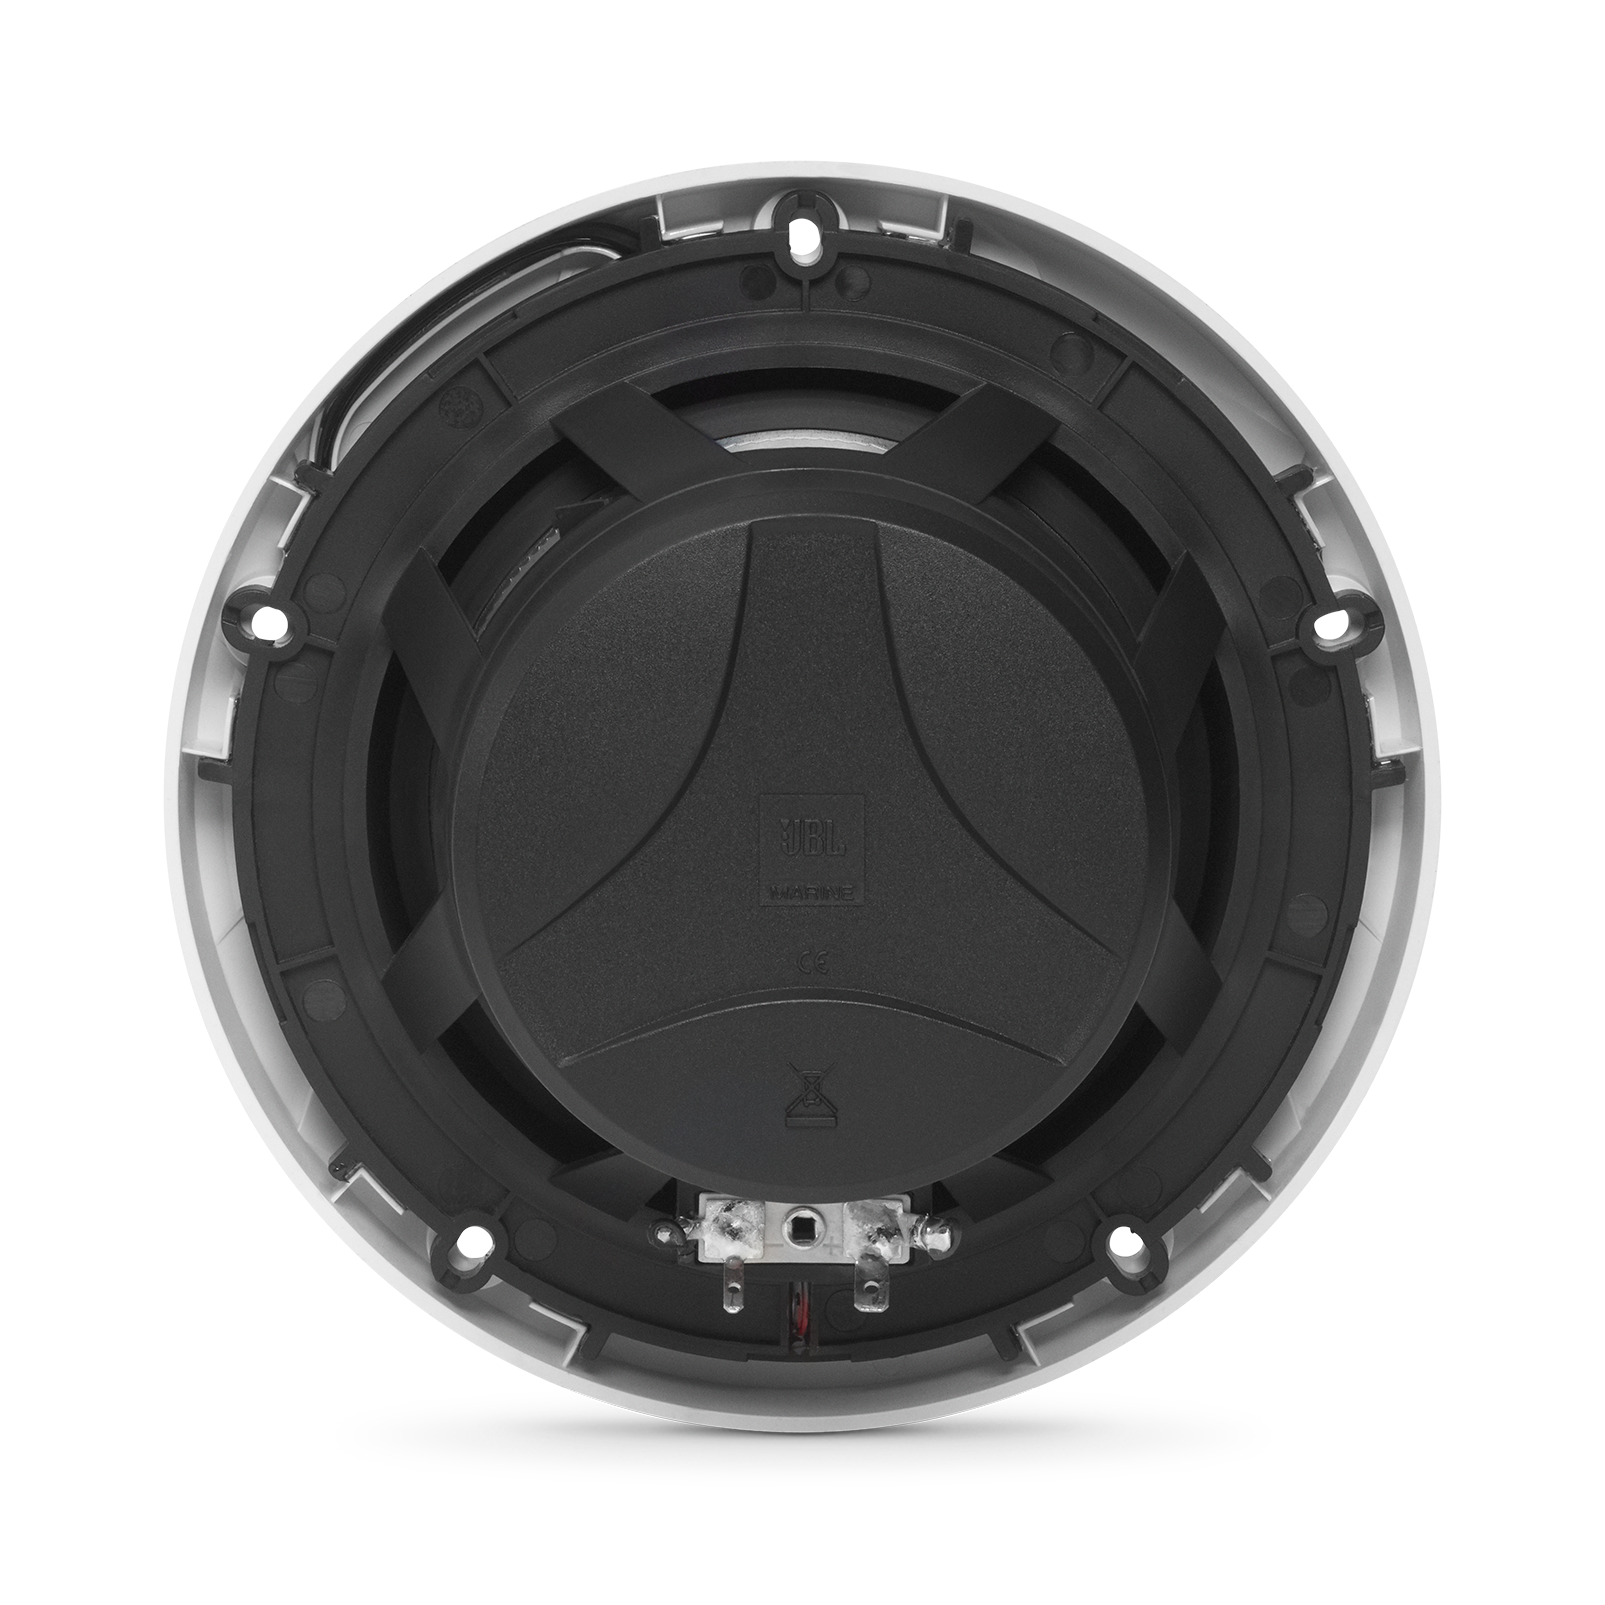 "Club Marine MS65LW - White Gloss - Club Marine MS65LW—6-1/2"" (160mm) two-way marine audio multi-element speaker with RGB lighting – White - Back"